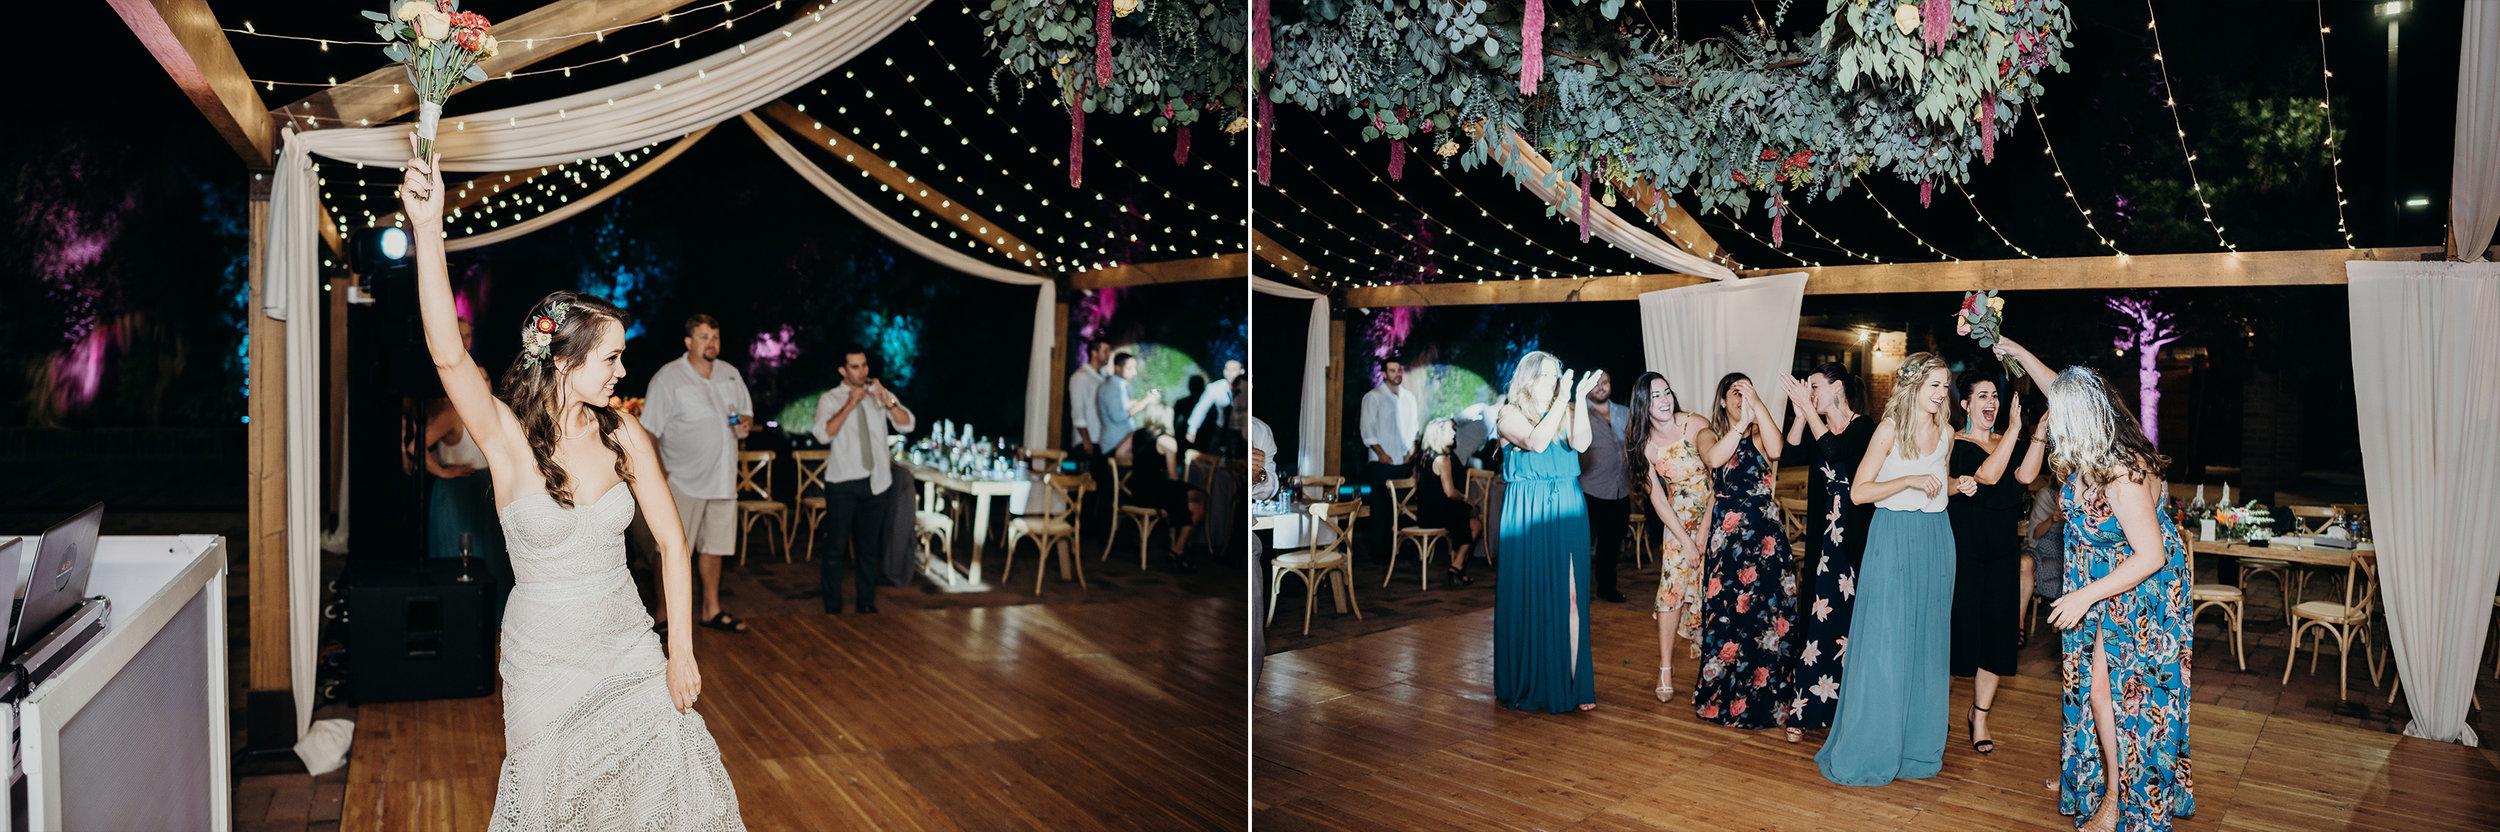 Julia+Tyler Wedding-556-559.jpg